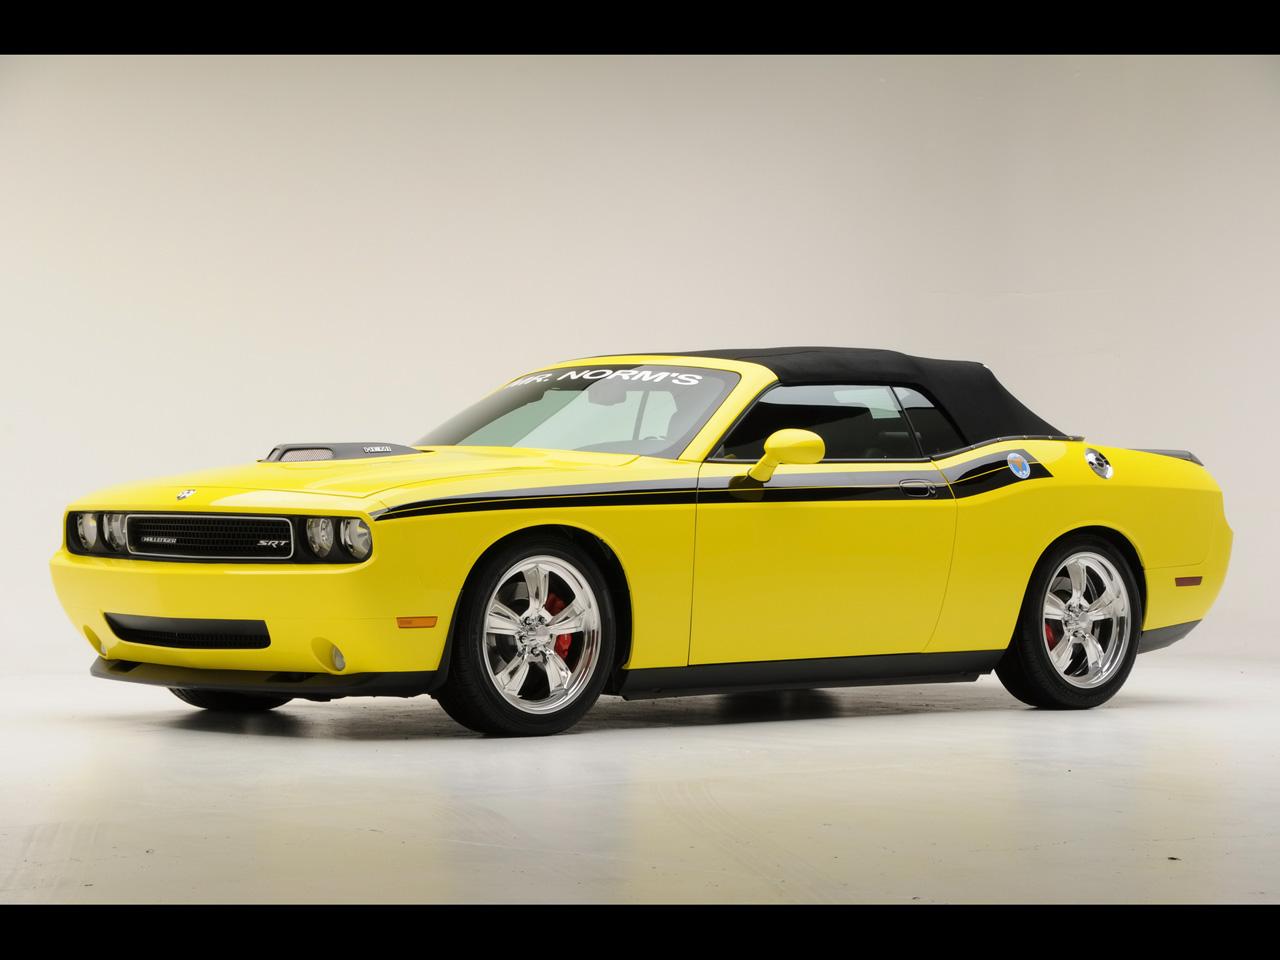 2017 Challenger 426 Hemi | 2017 - 2018 Best Cars Reviews